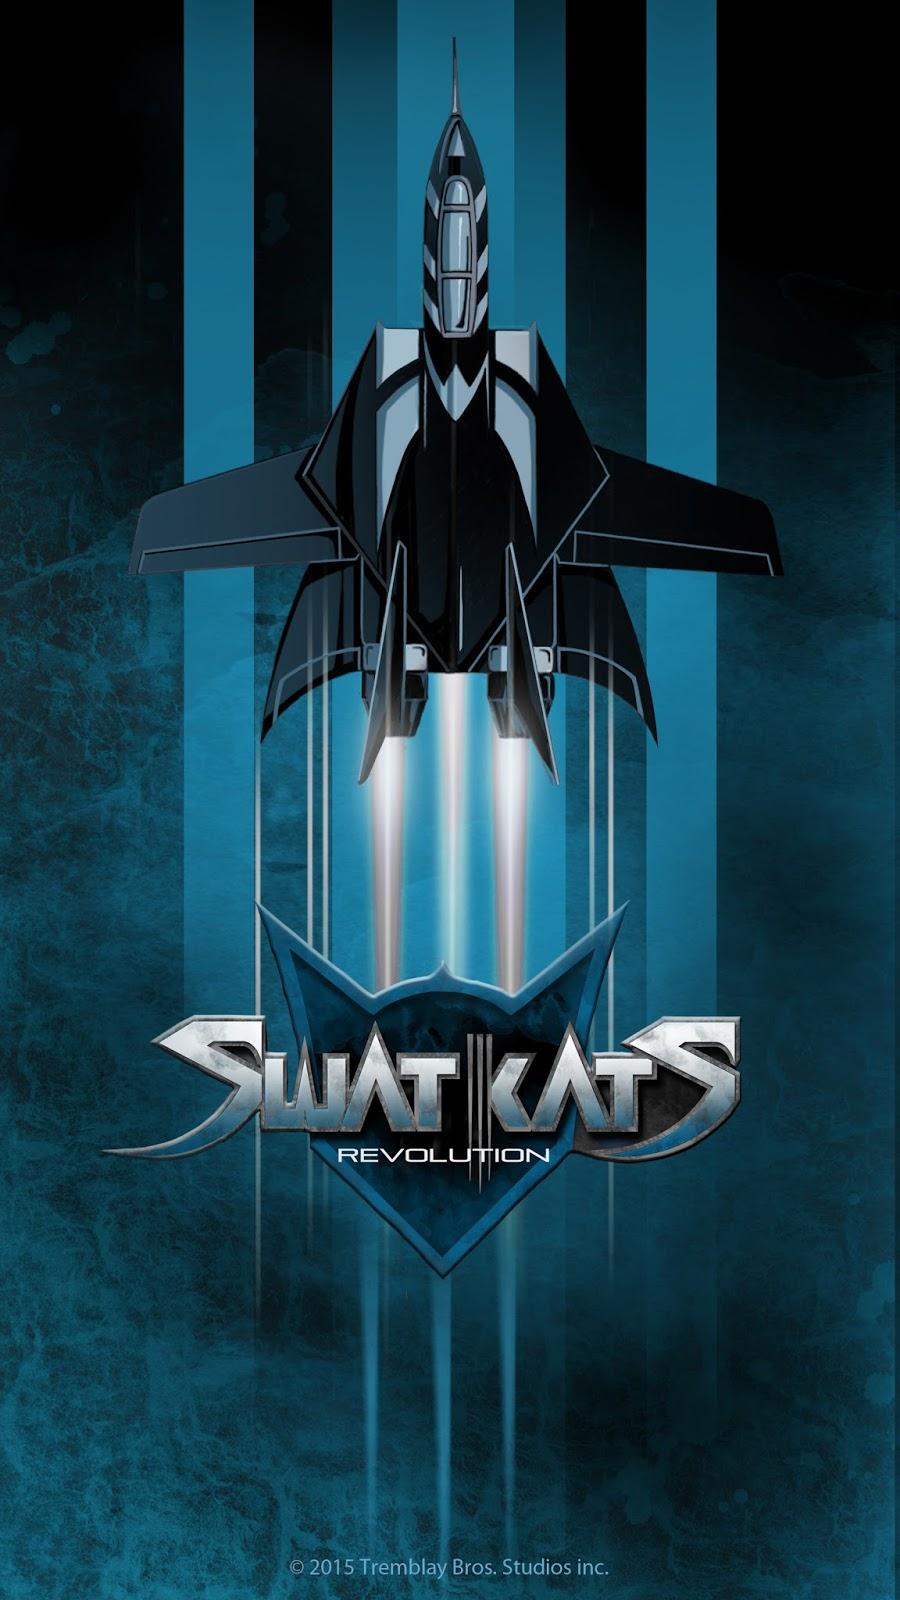 Swat Kats Revolution: MOBILE WALLPAPERS